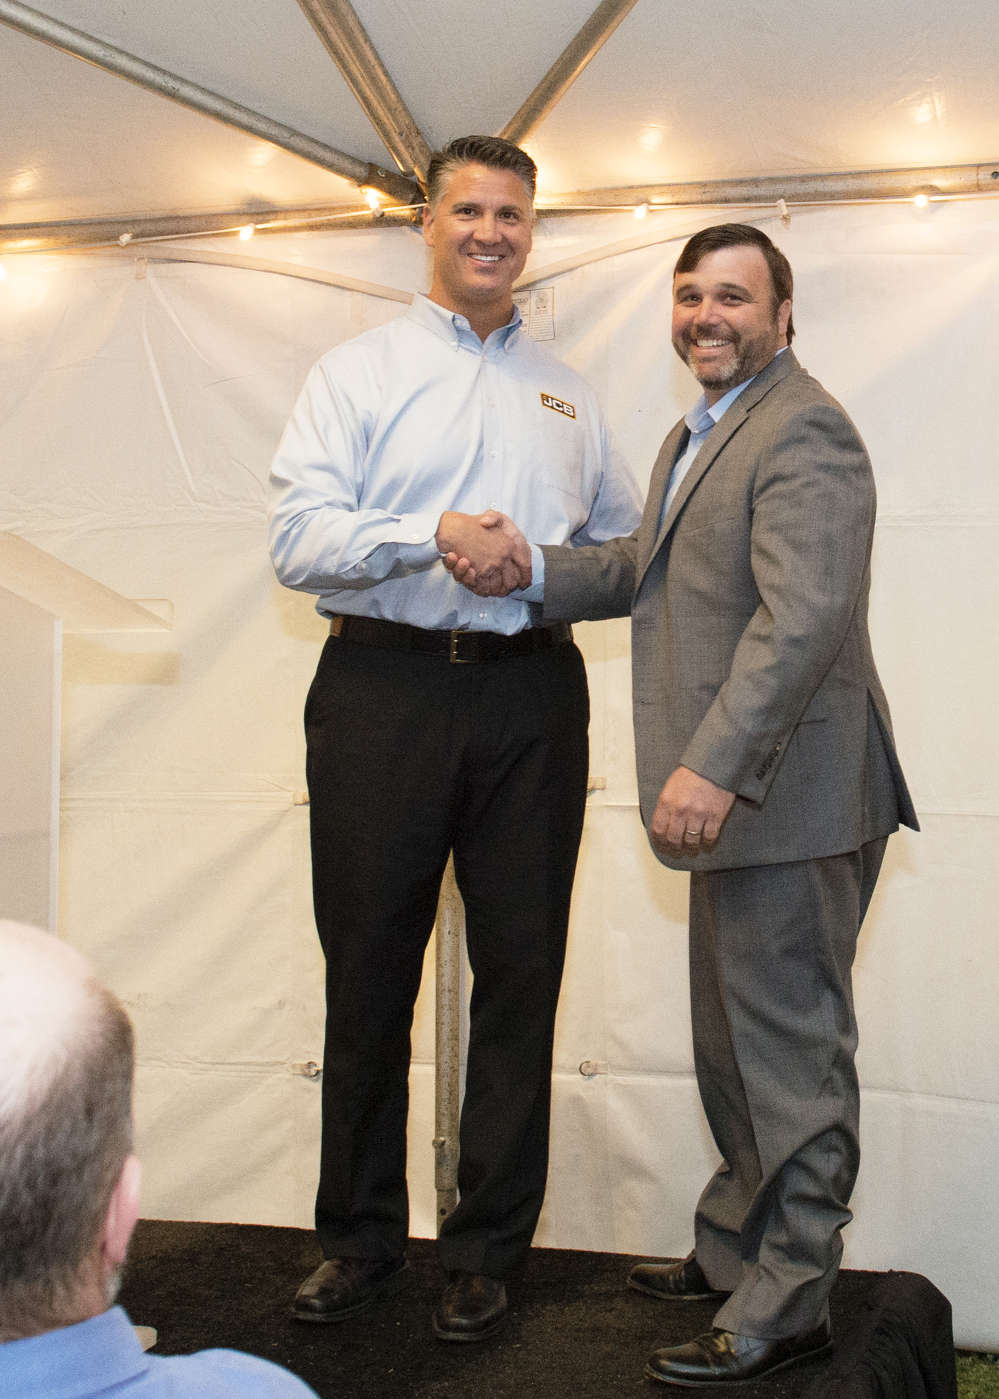 Dan Schmidt (L), vice president of sales of JCB North America, and Chris Shea, owner of JCB of Georgia.